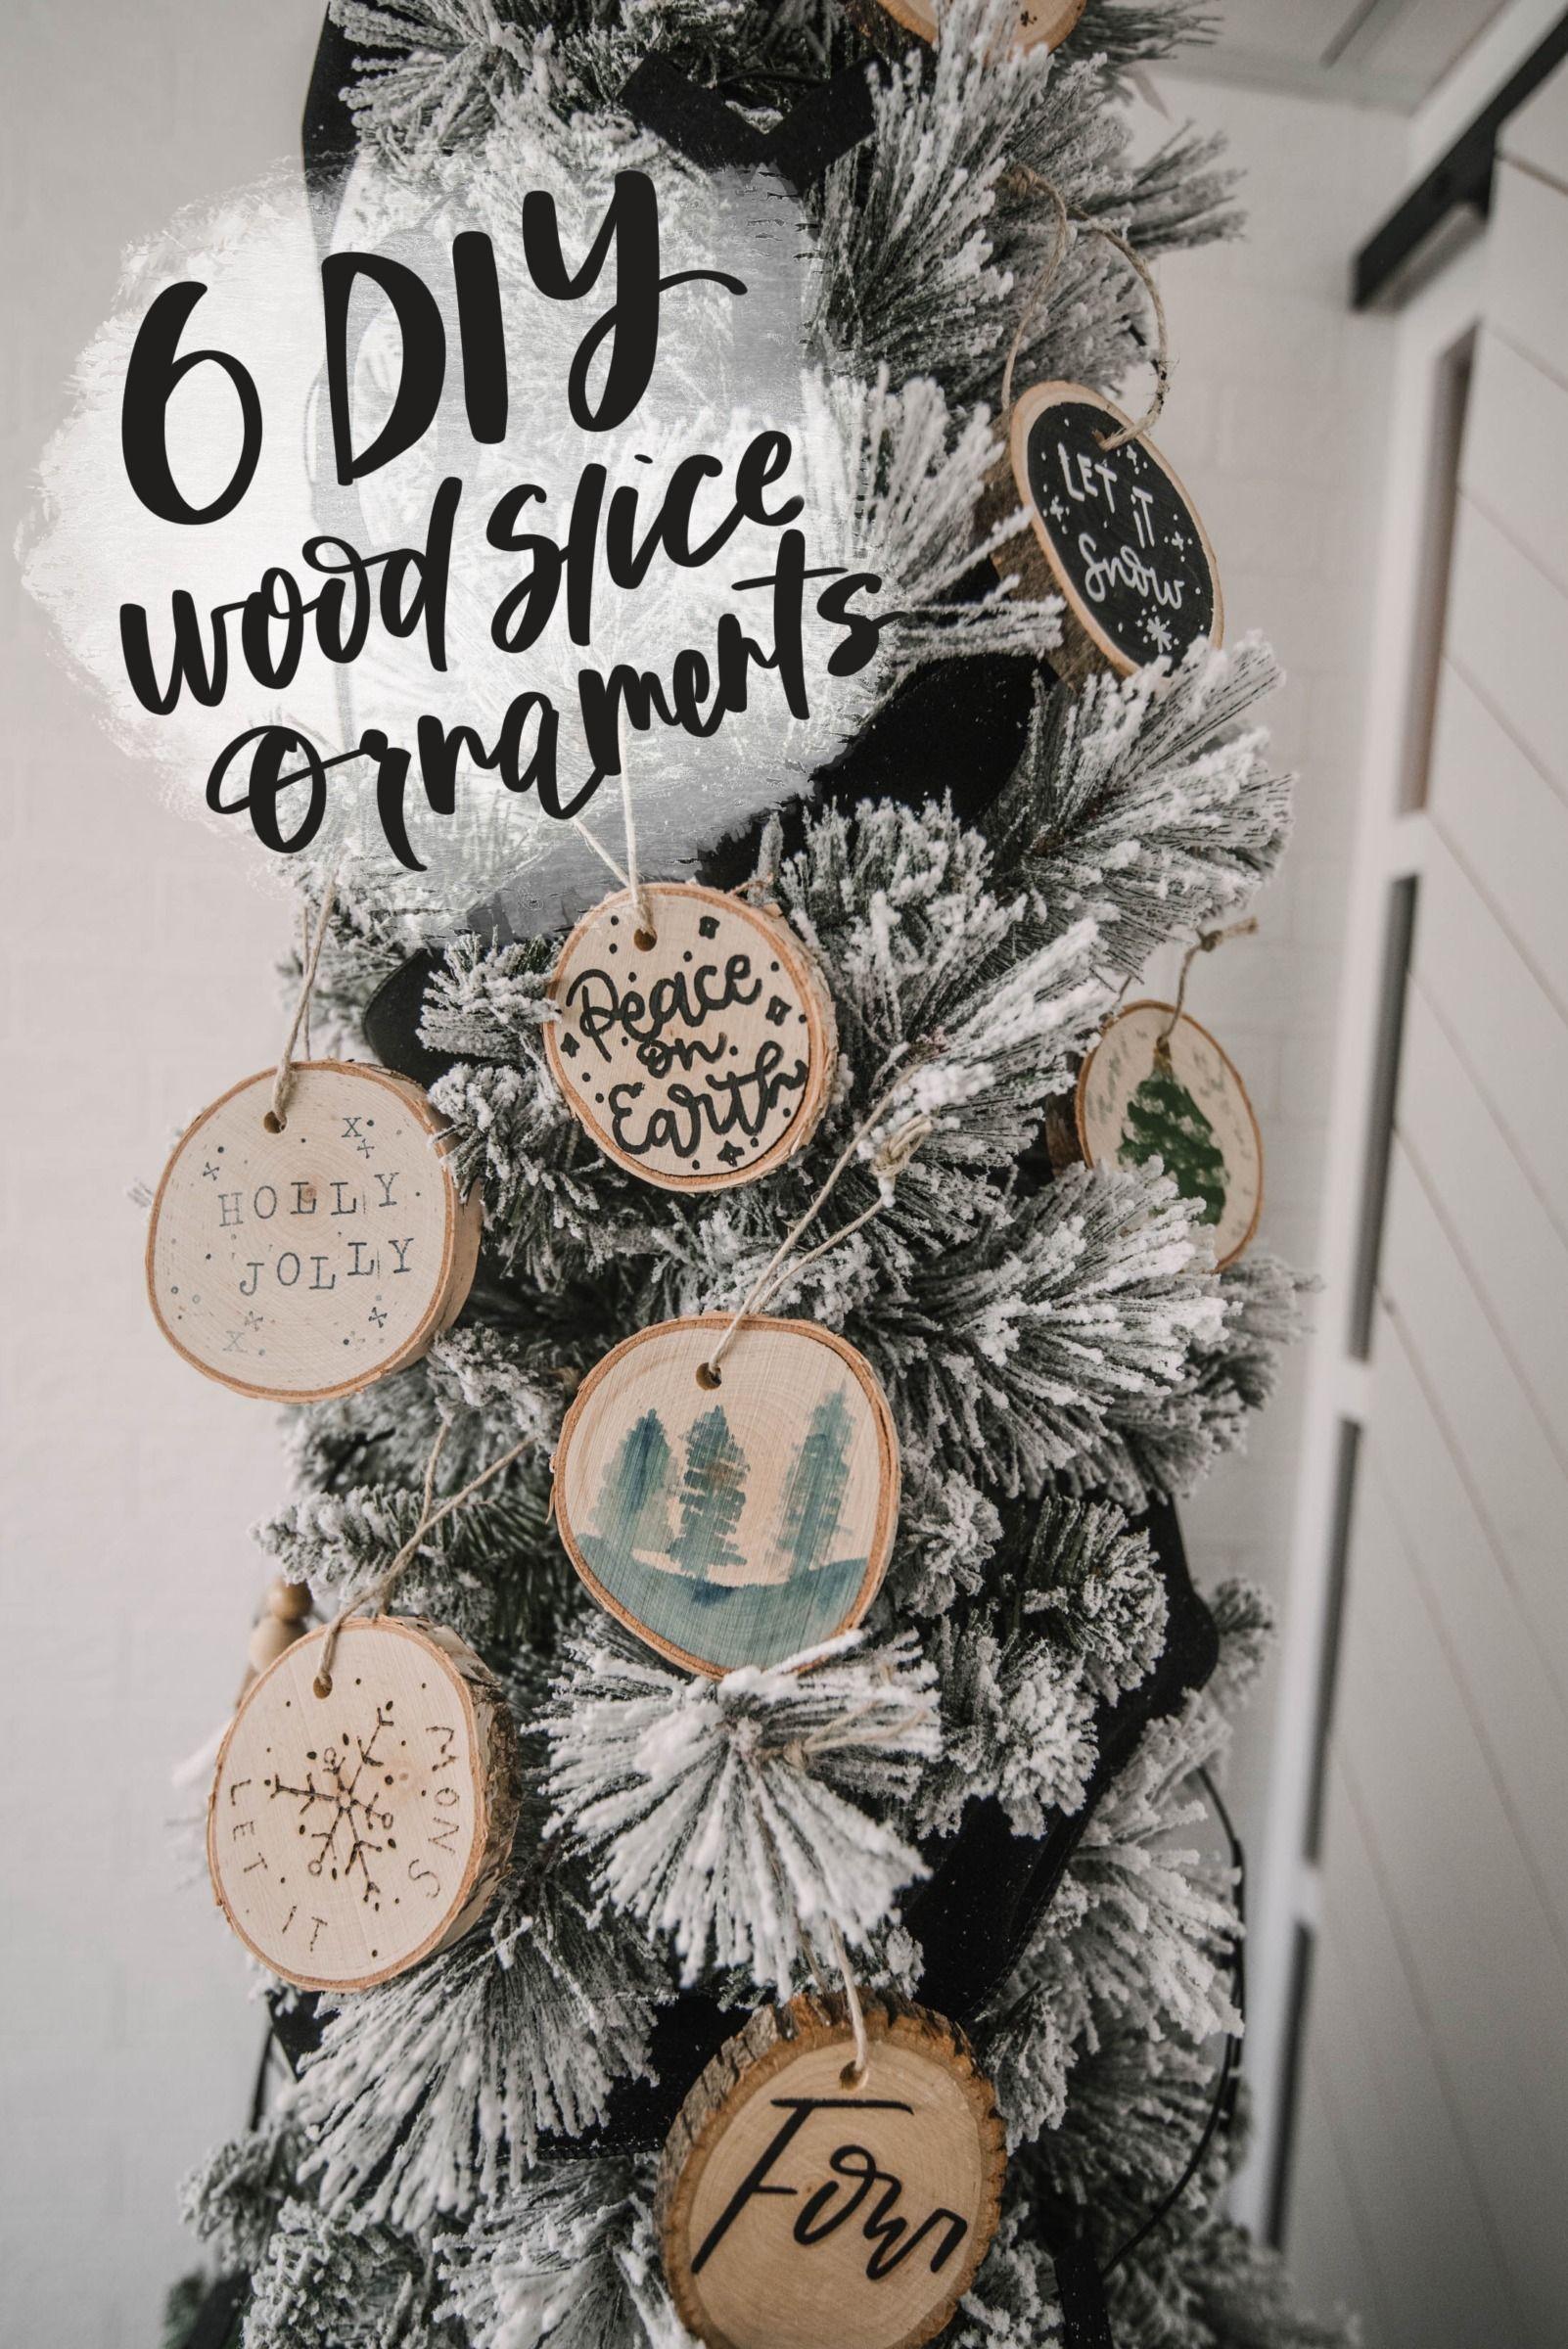 6 Diy Wood Slice Ornaments Lemon Thistle Wood Slice Ornament Diy Christmas Ornaments Christmas Tree Painting